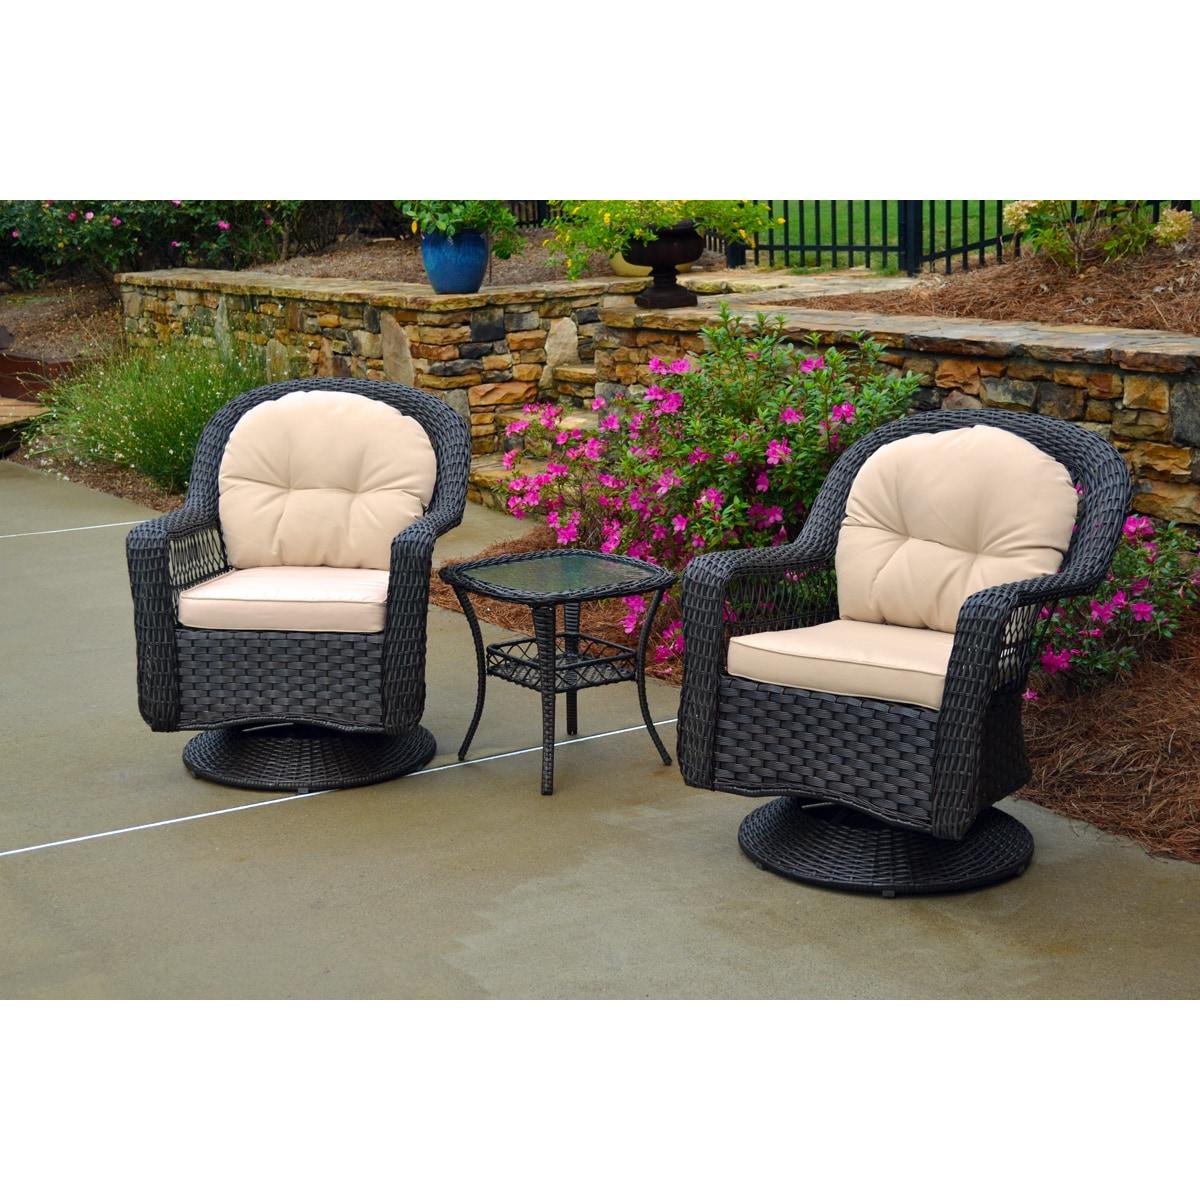 Marvelous Biloxi Outdoor Espresso Resin Wicker 3 Piece Swivel Glider Set With Beige Cushions Beatyapartments Chair Design Images Beatyapartmentscom